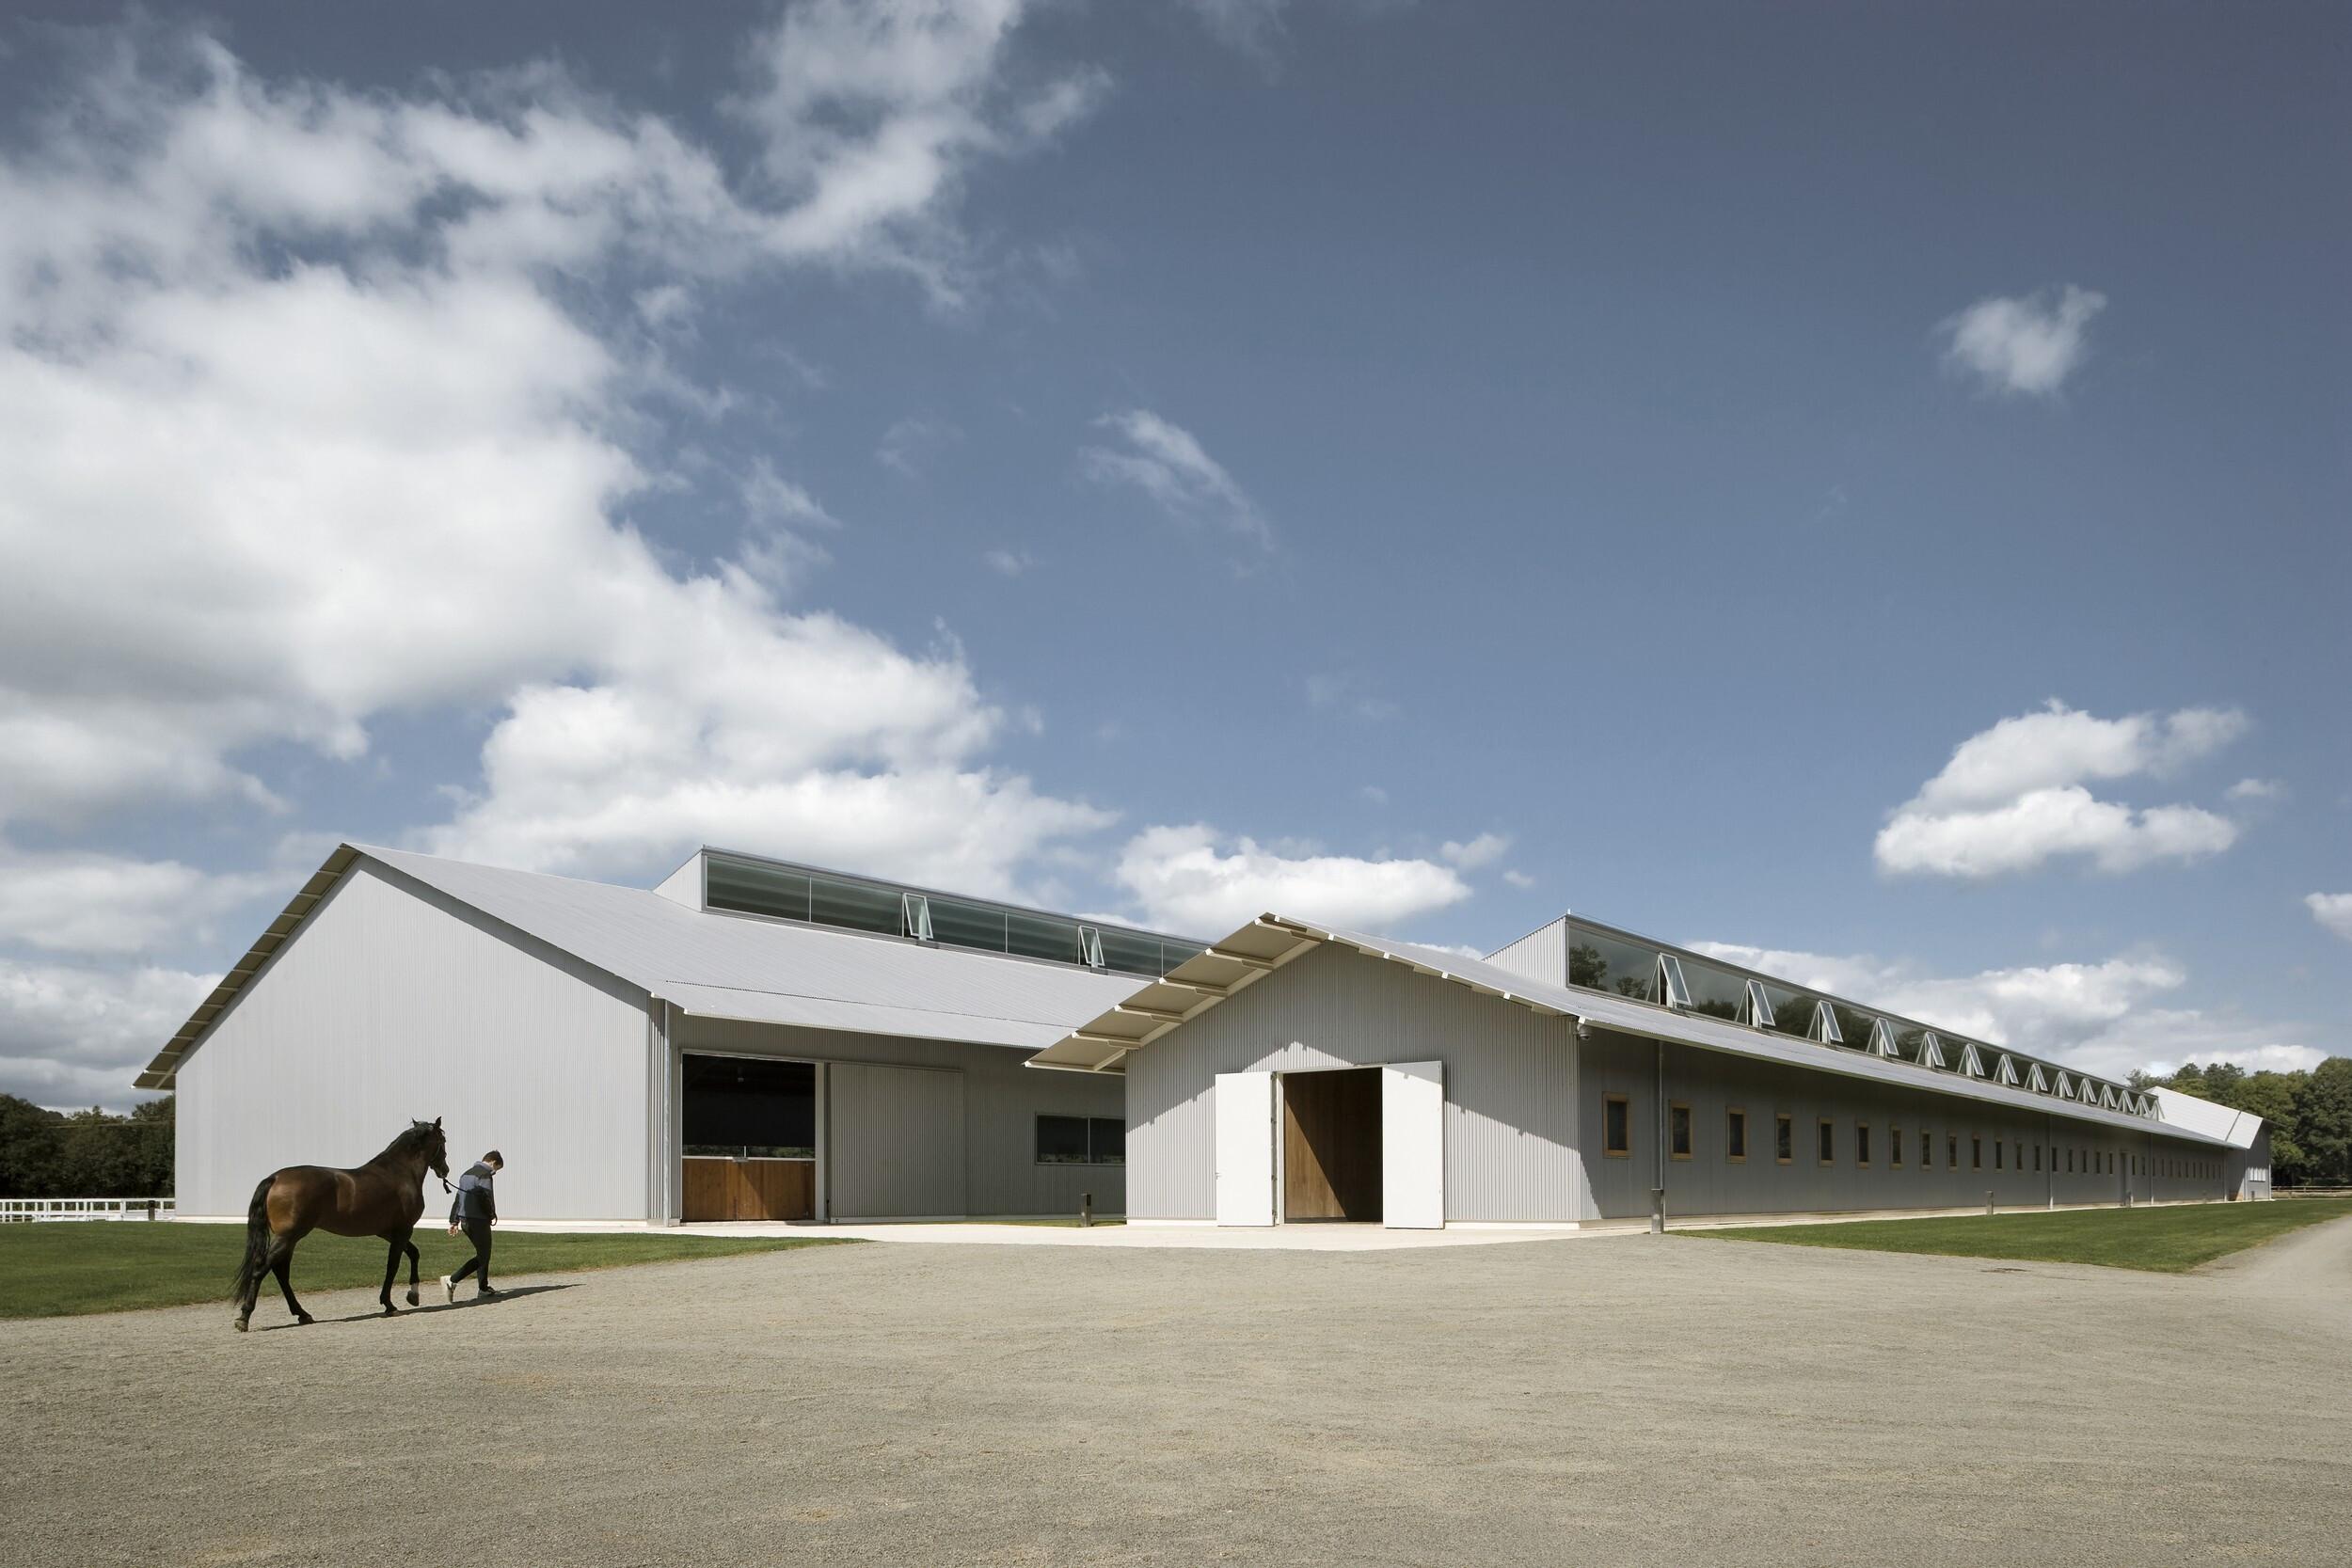 Elite Equestrian Center